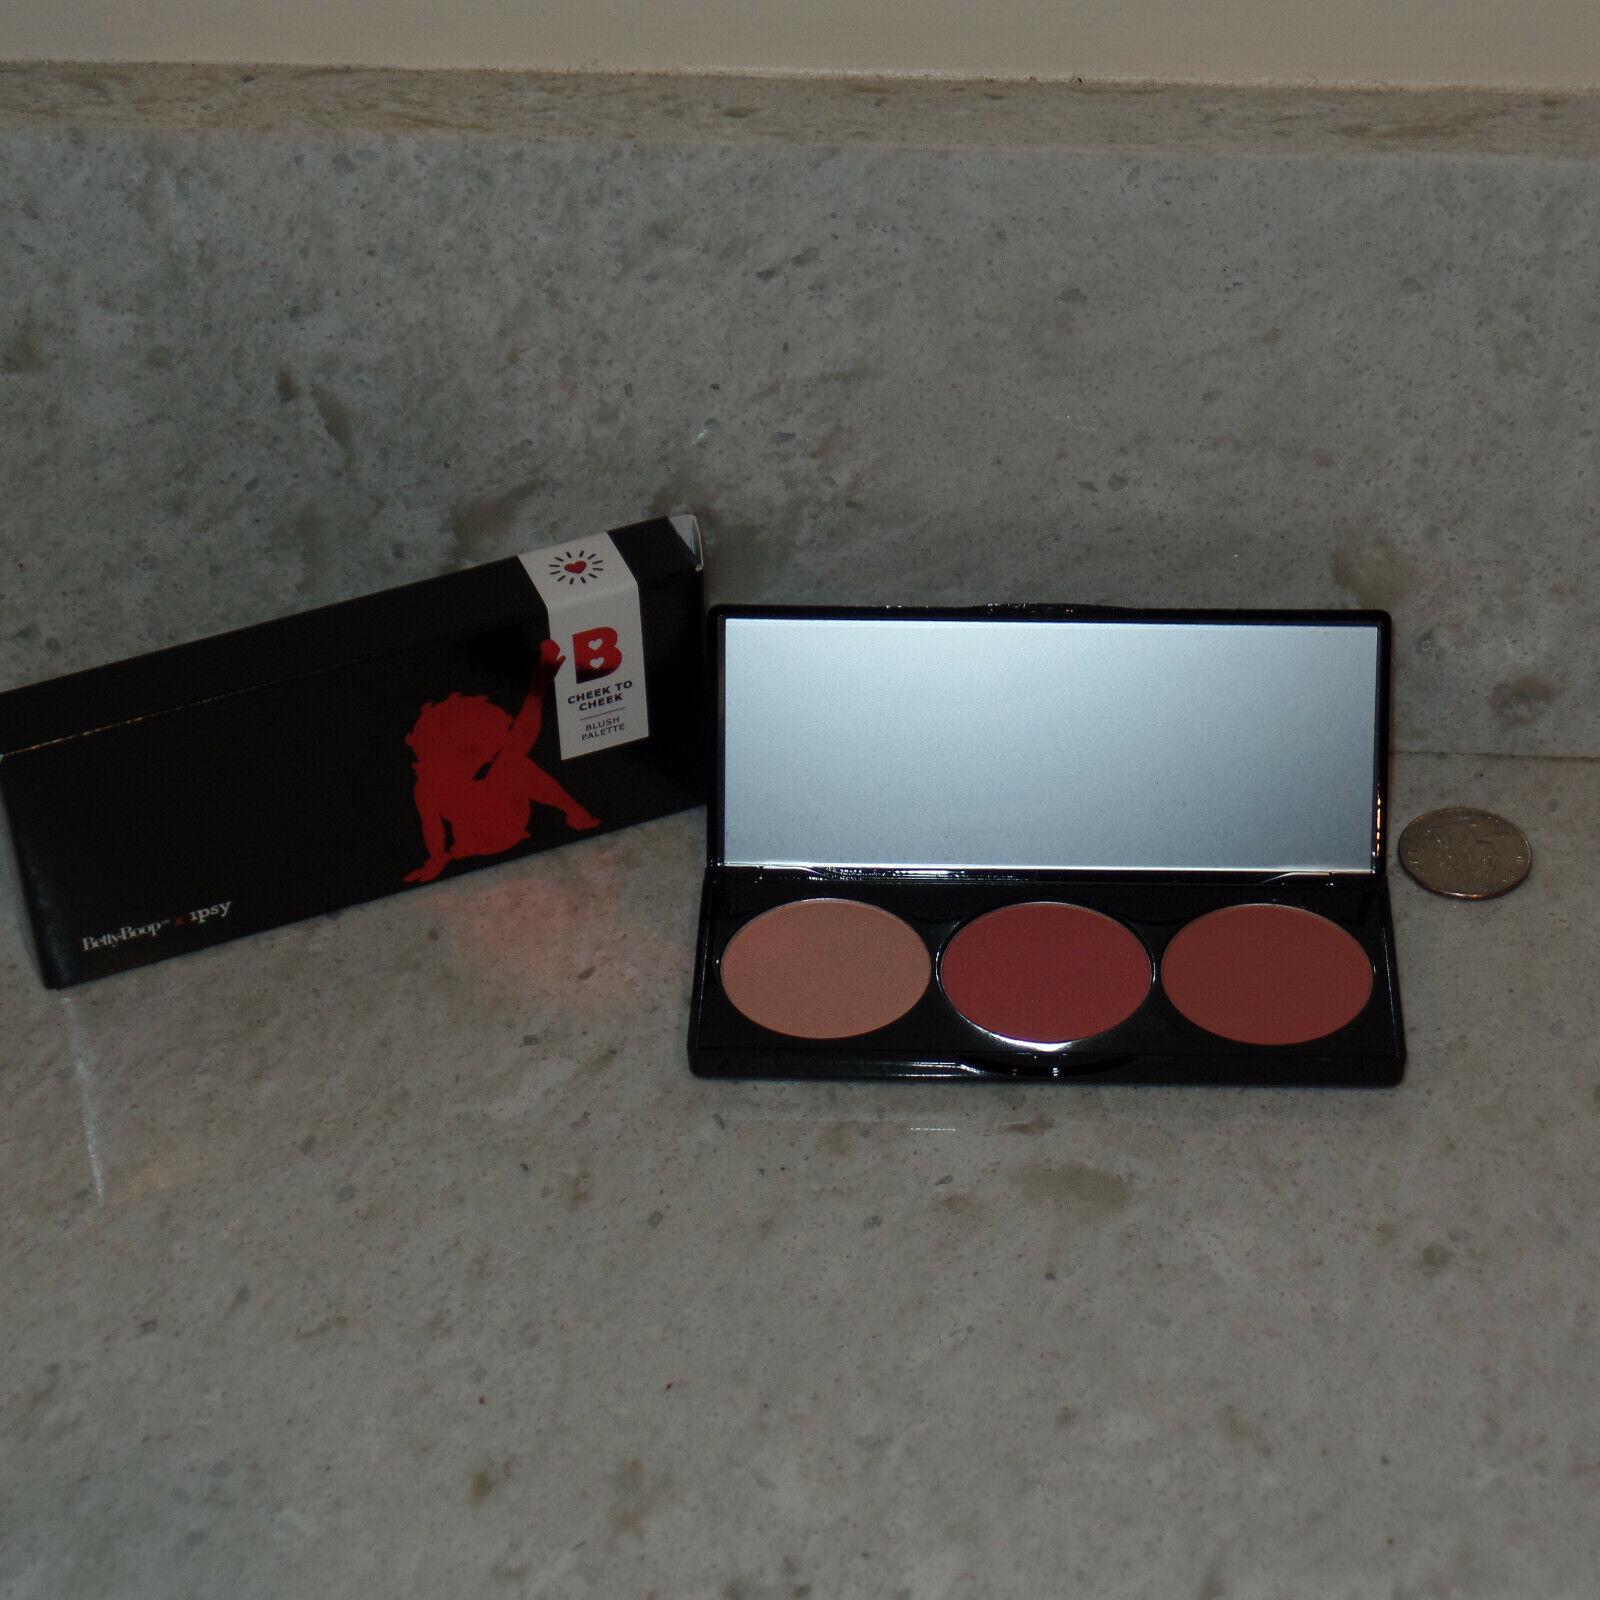 FULL SIZE Betty Boop X Ipsy Cheek To Cheek Blush Palette 29oz 8.4g - $9.88